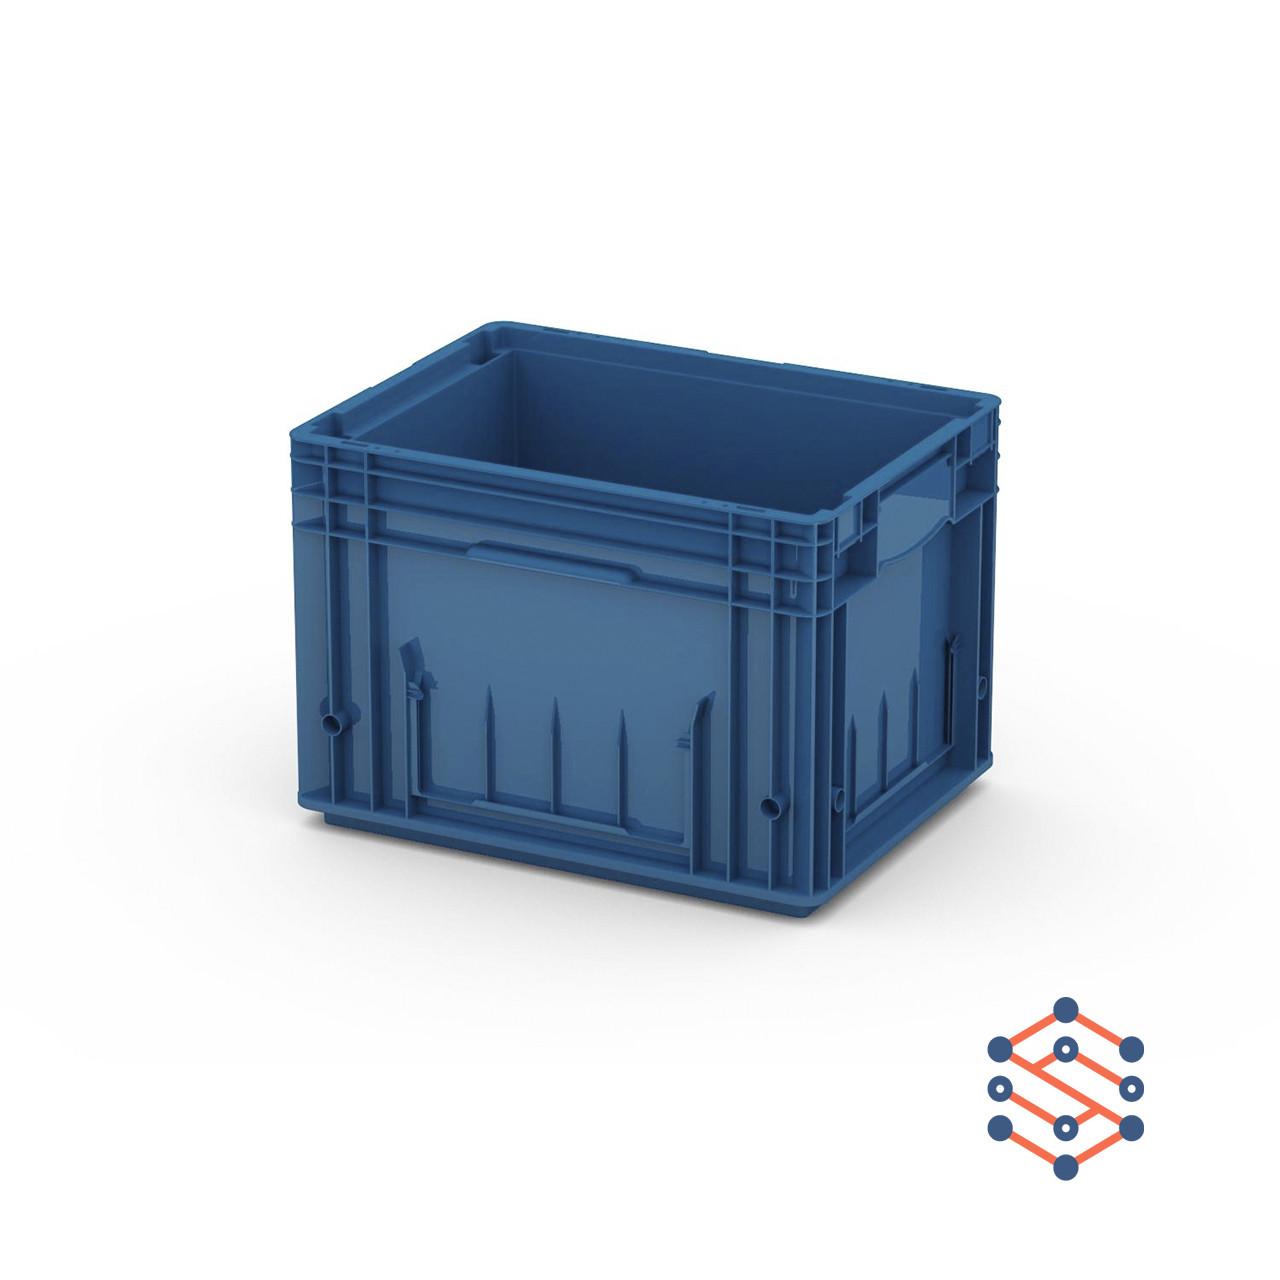 Пластиковый ящик RL-KLT 4280 396х297х280 мм